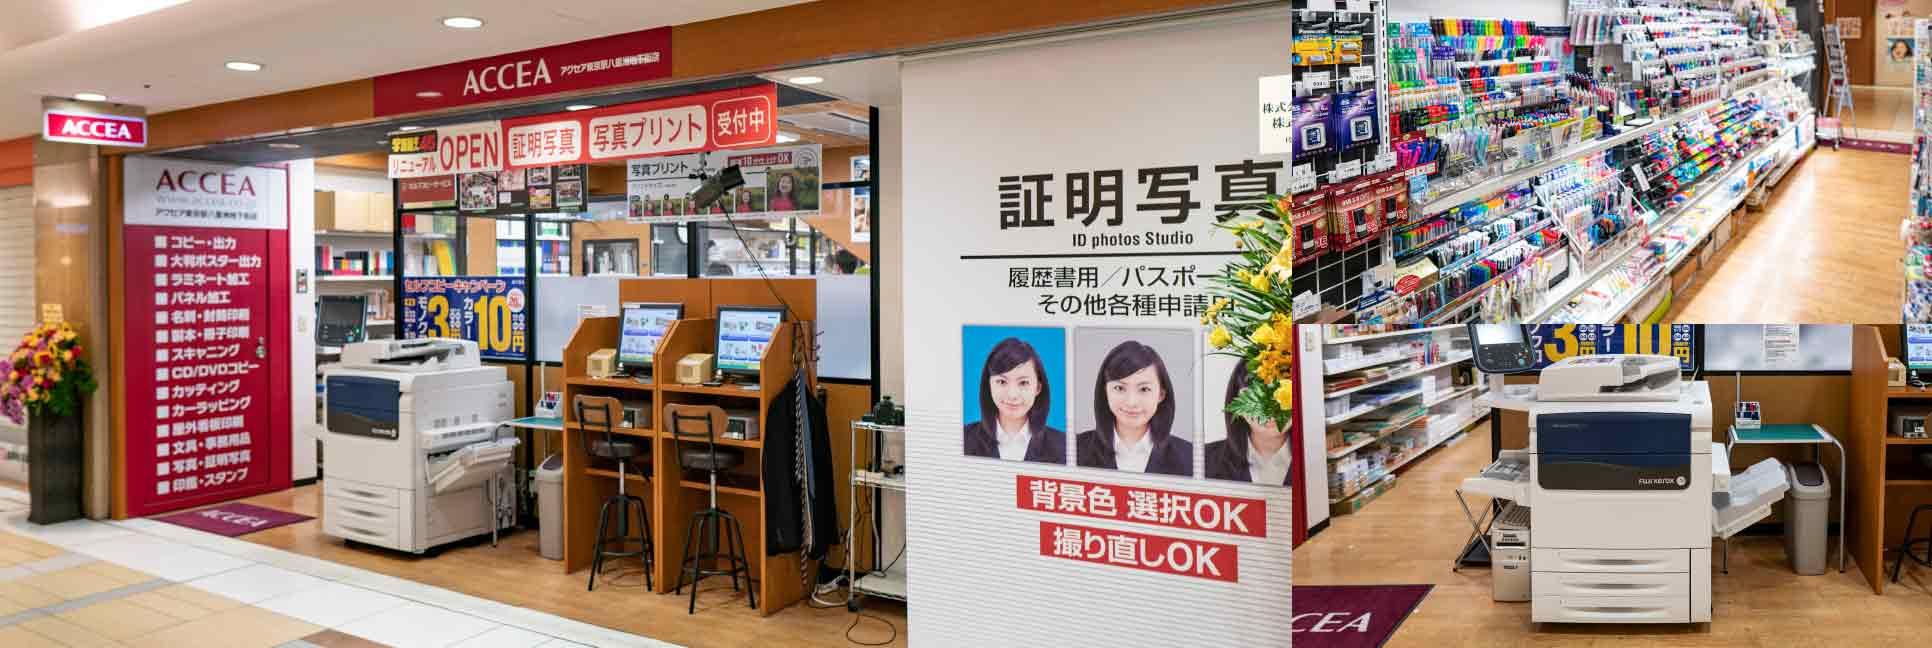 東京駅八重洲地下街店オープン